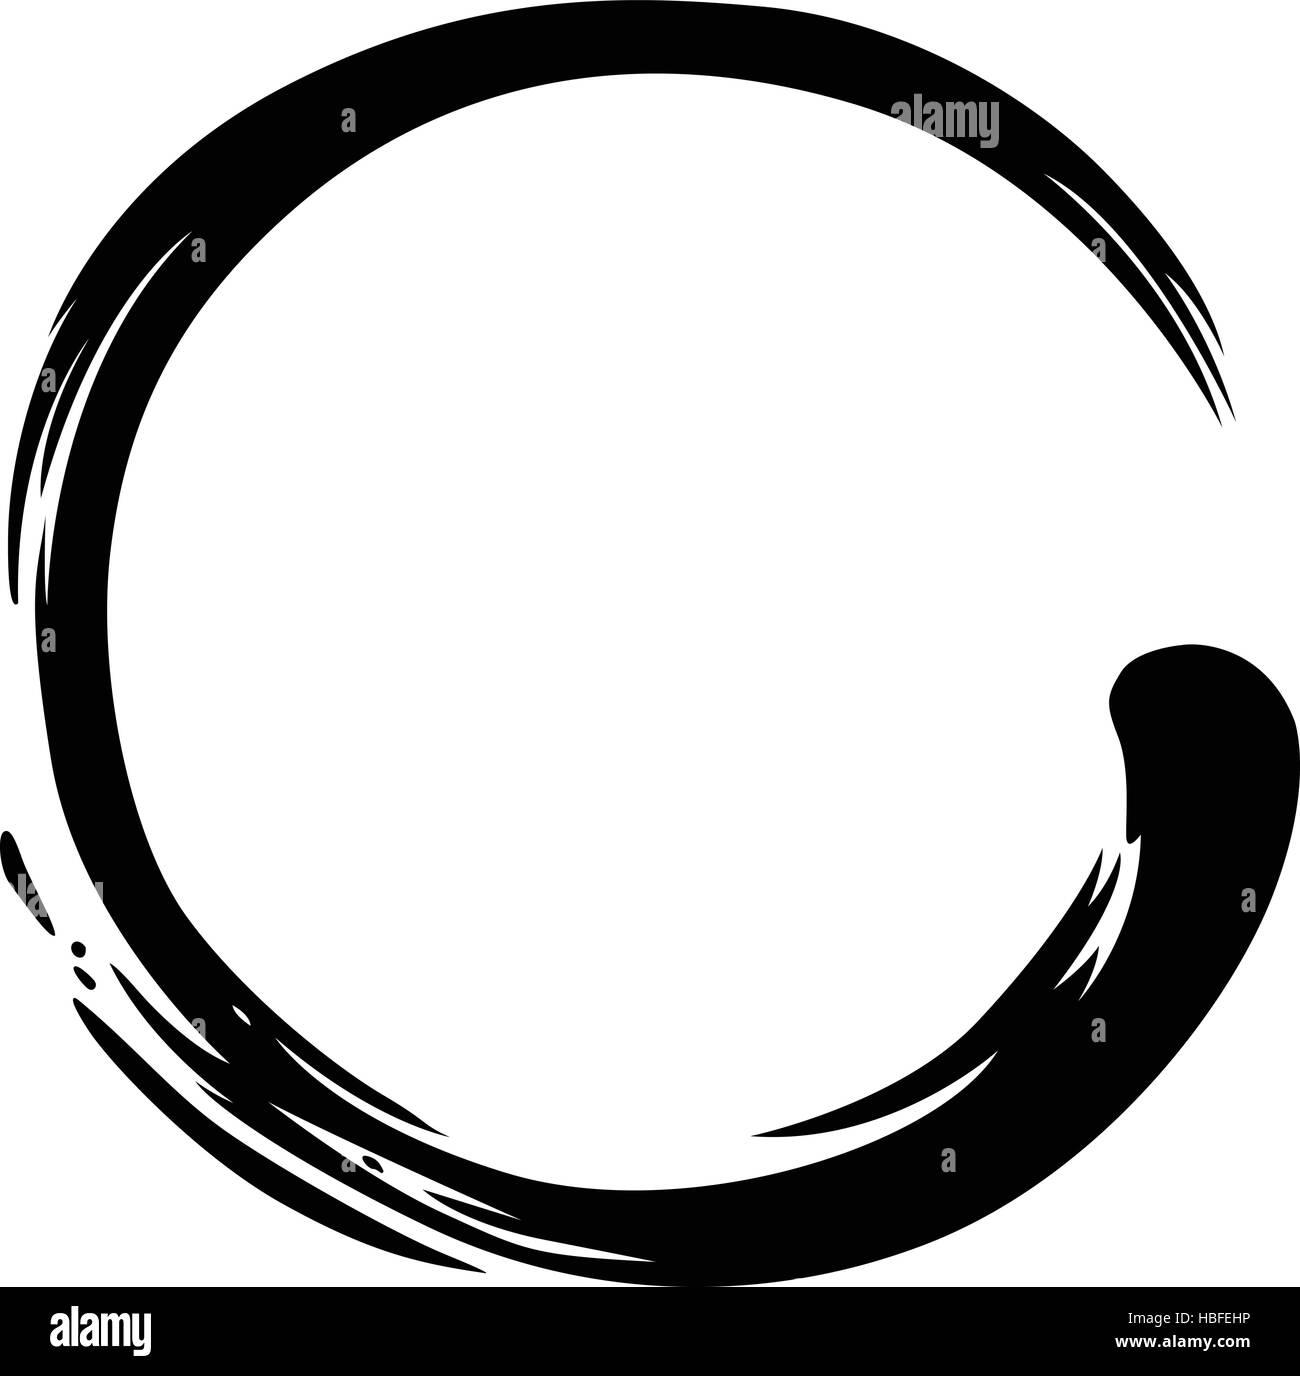 Black Enso Zen Circle Vector Illustration - Stock Image